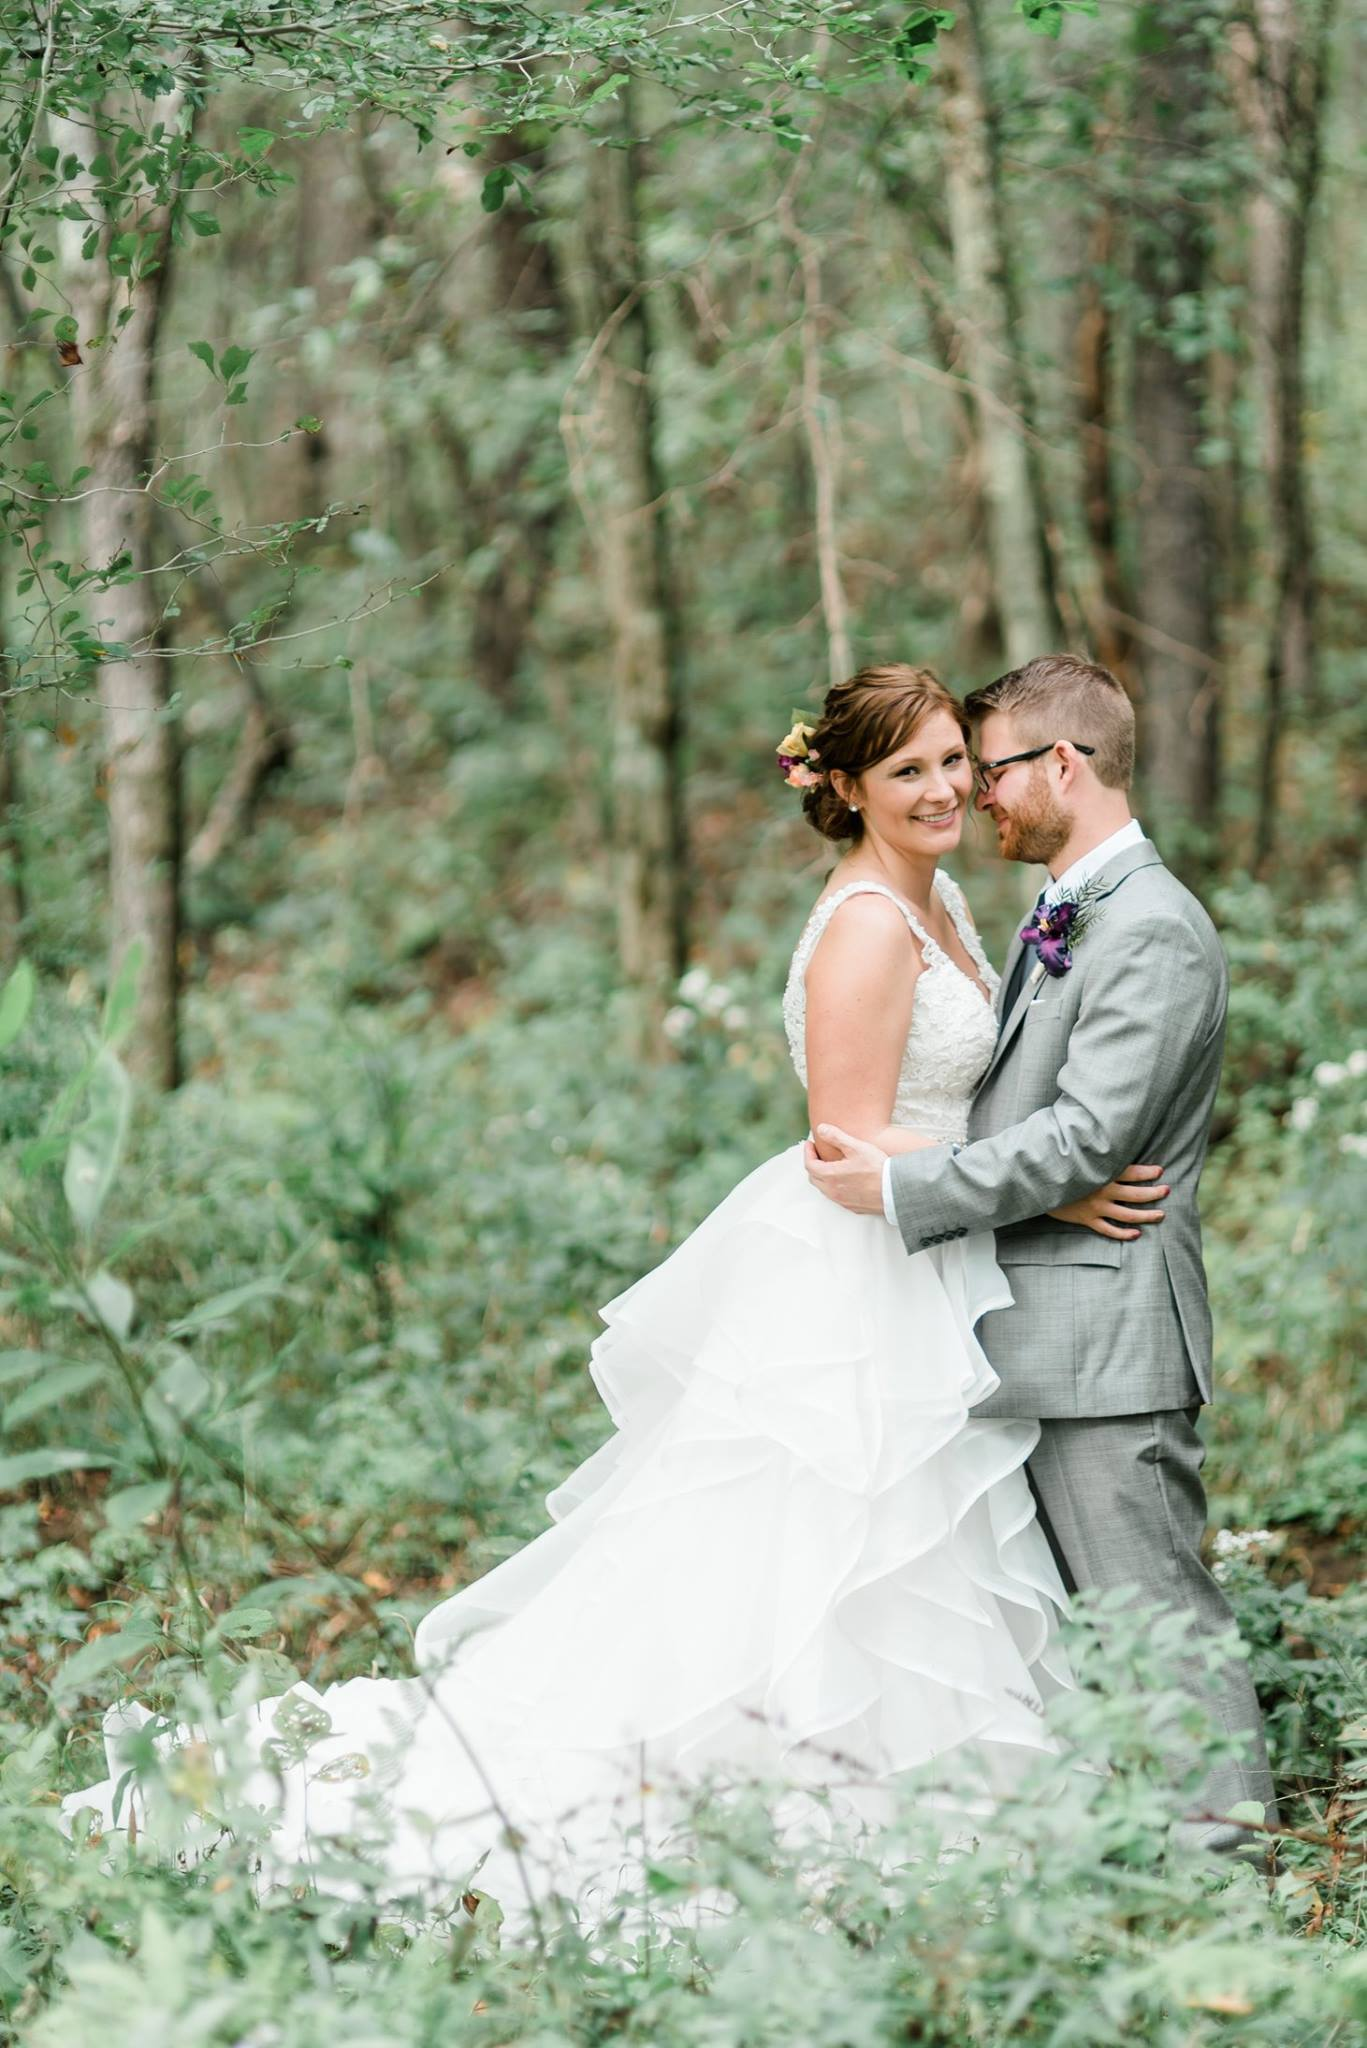 pennsylvania-backyard-wedding-love-diy-bohemian-romantic-colorful-0021.jpg